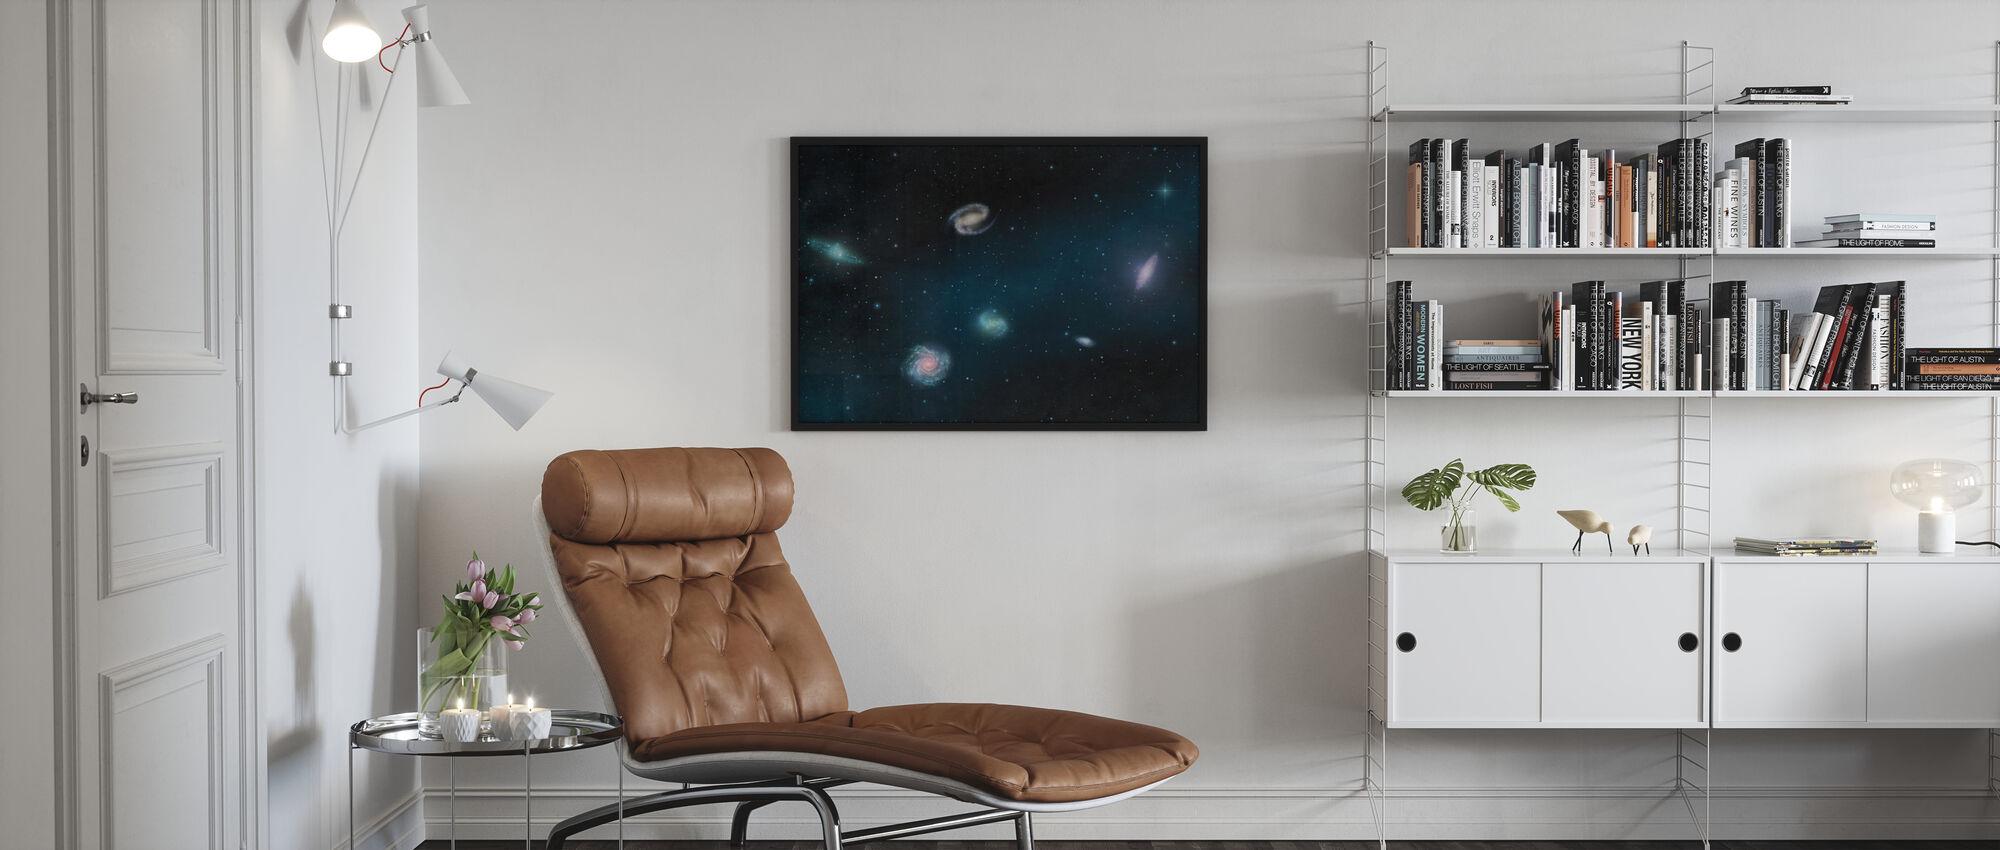 Darkest Dark - Galaxies - Poster - Living Room